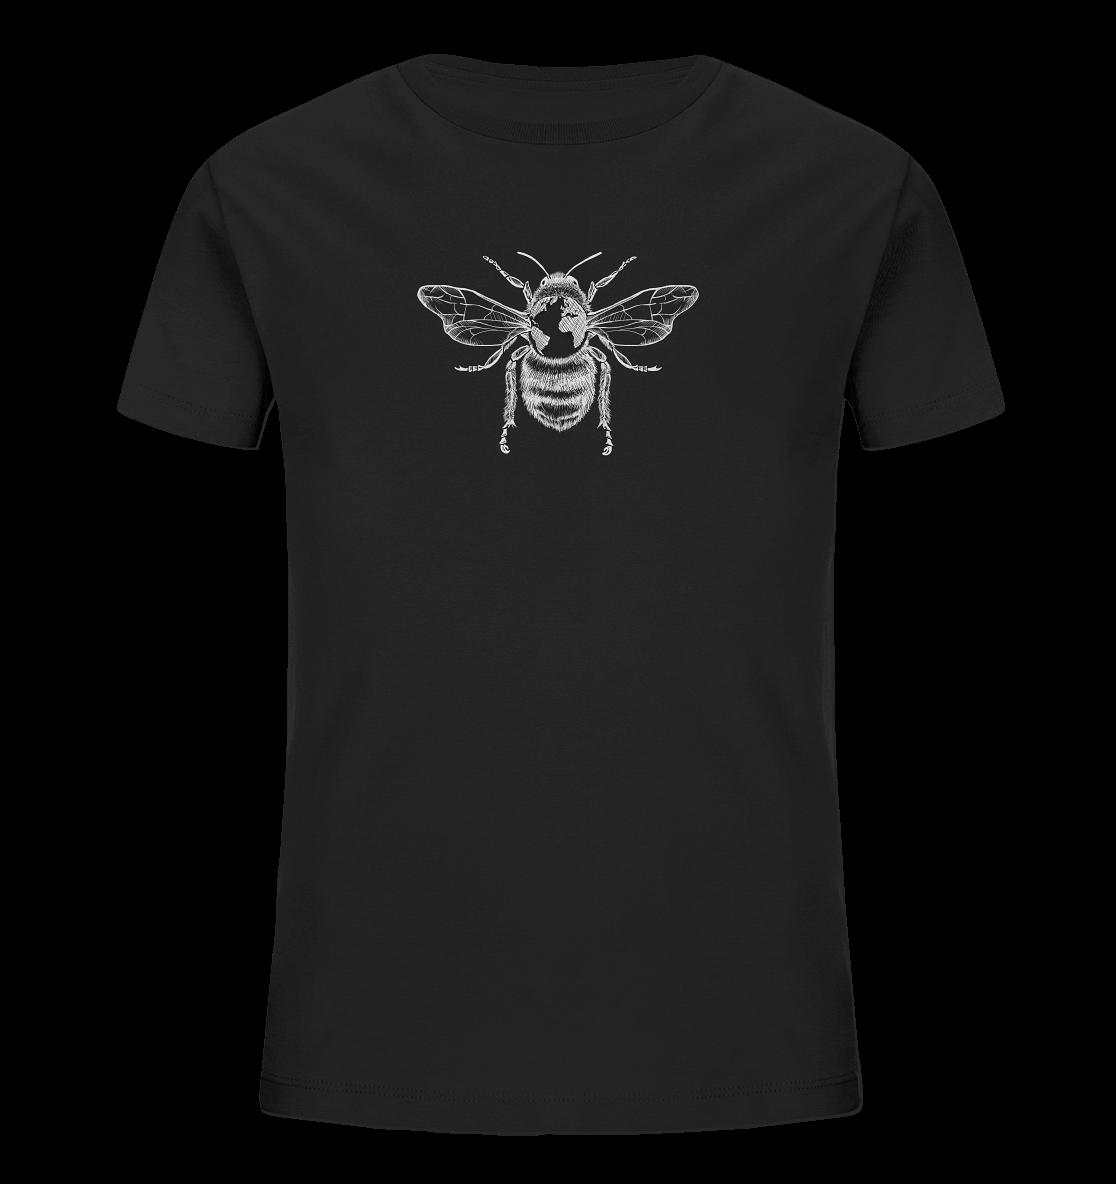 front-kids-organic-shirt-272727-1116x-2.png